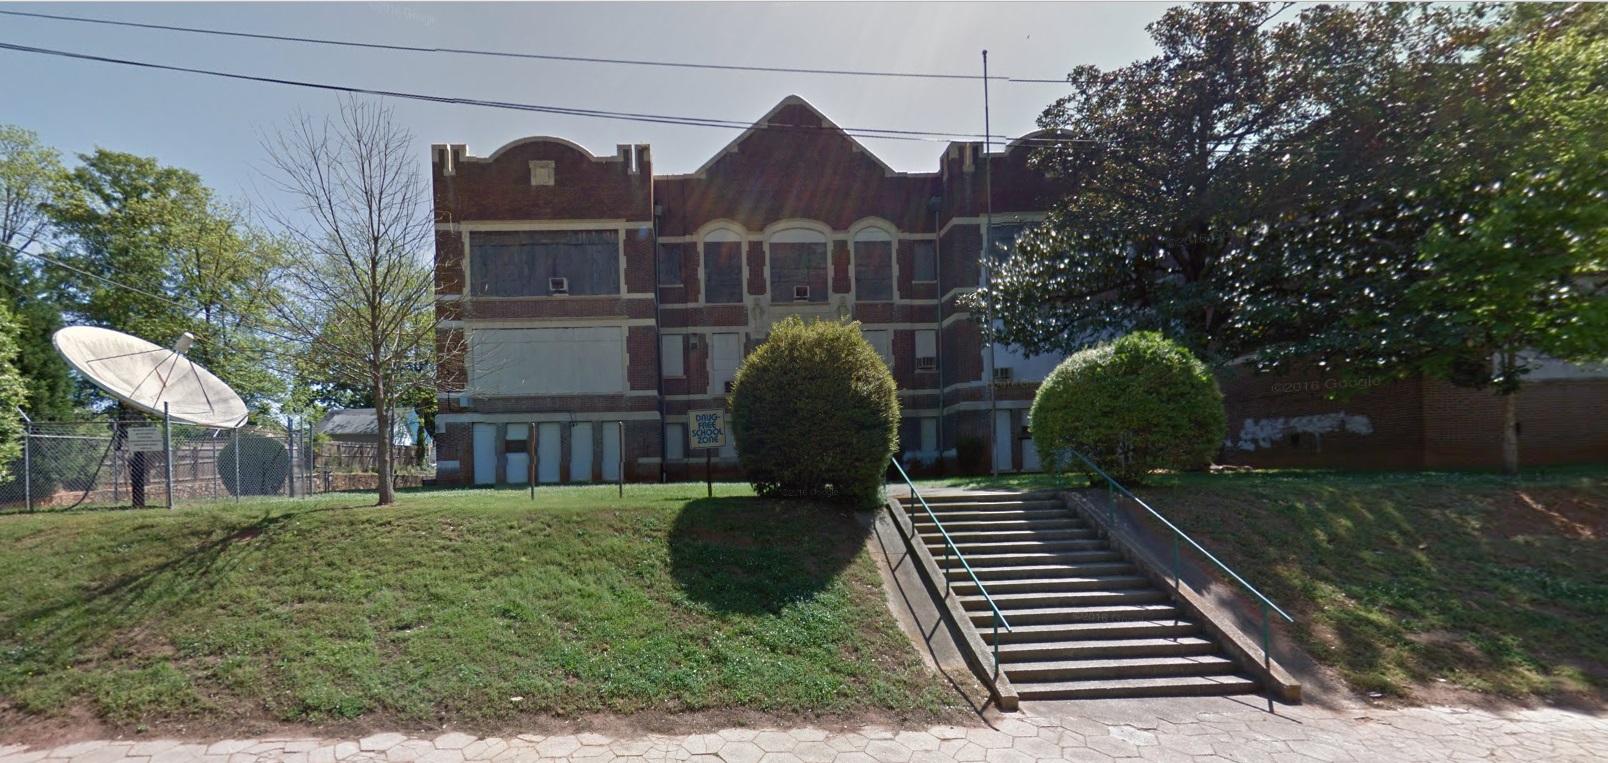 Adair Elementary on Catherine St. in Atlanta, GA.